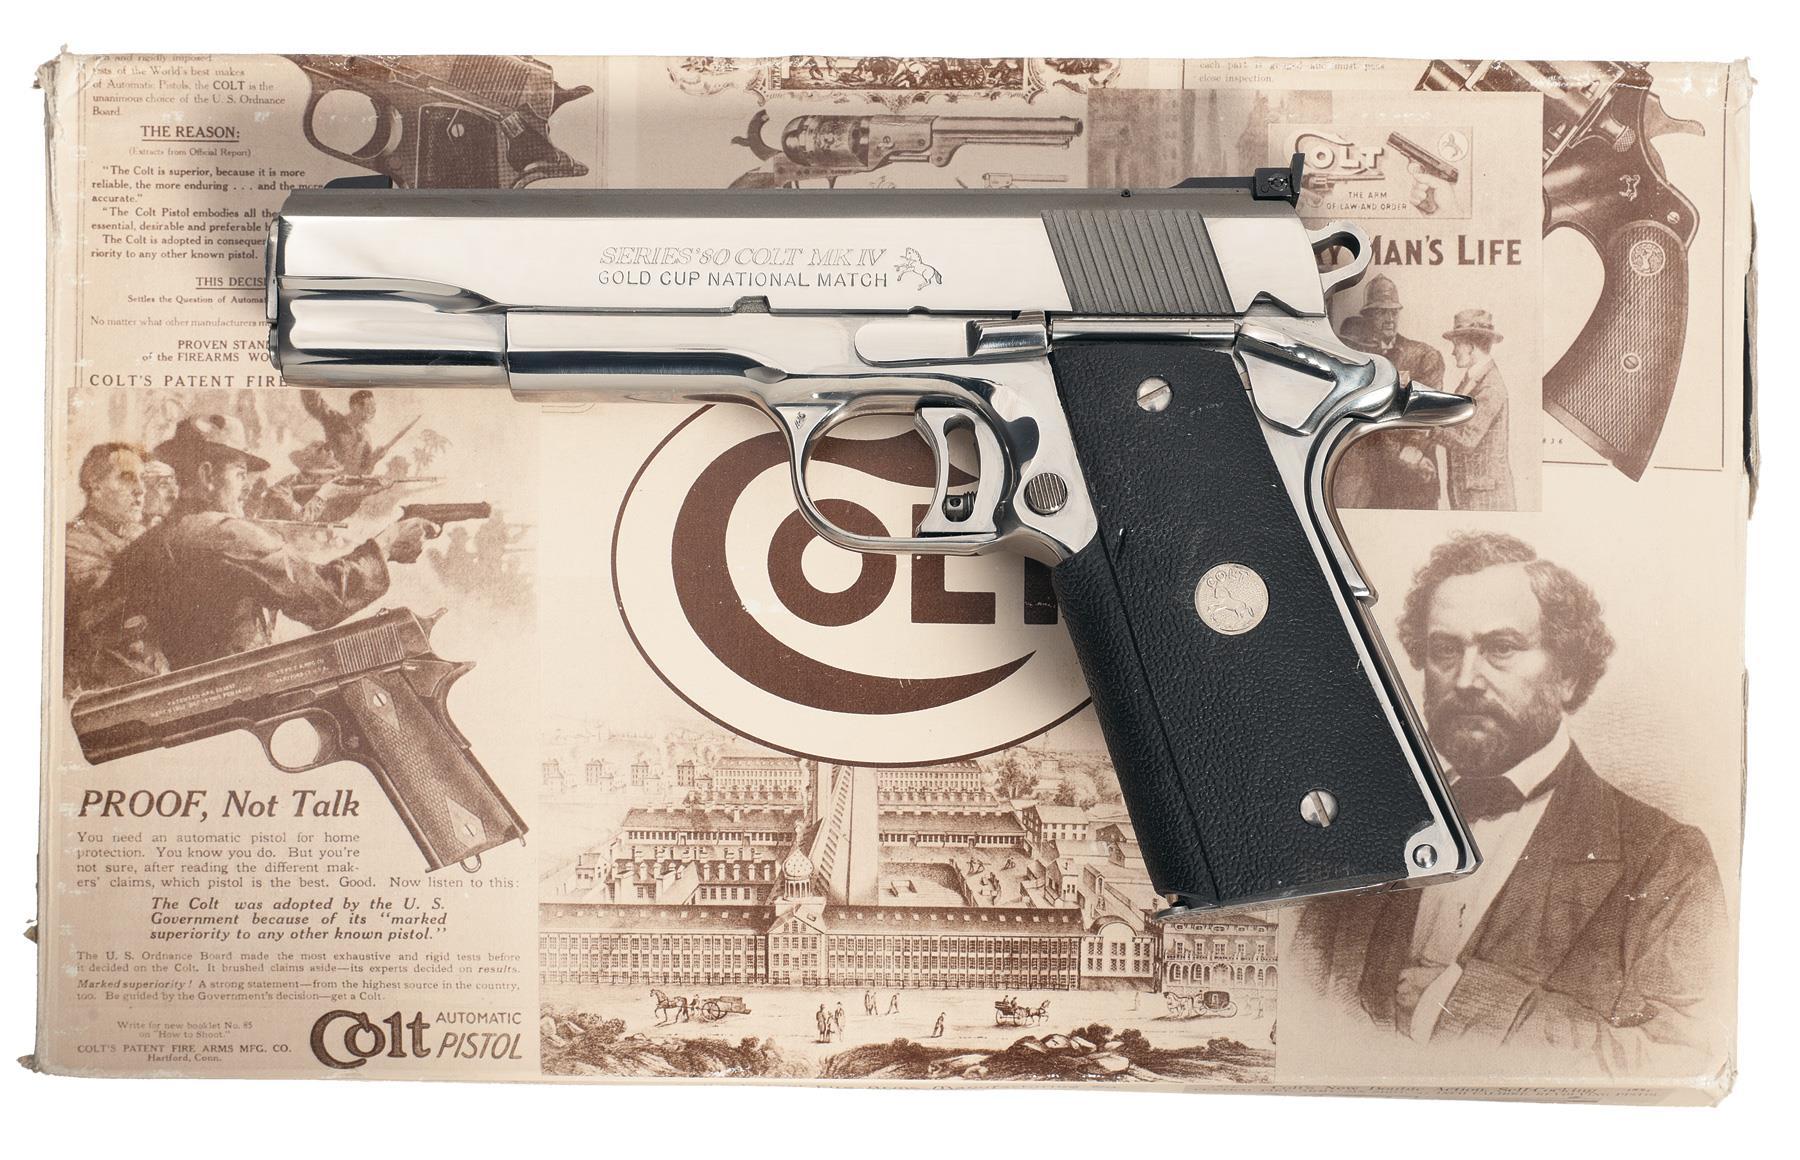 Colt Series 80 Pistol 45 ACP